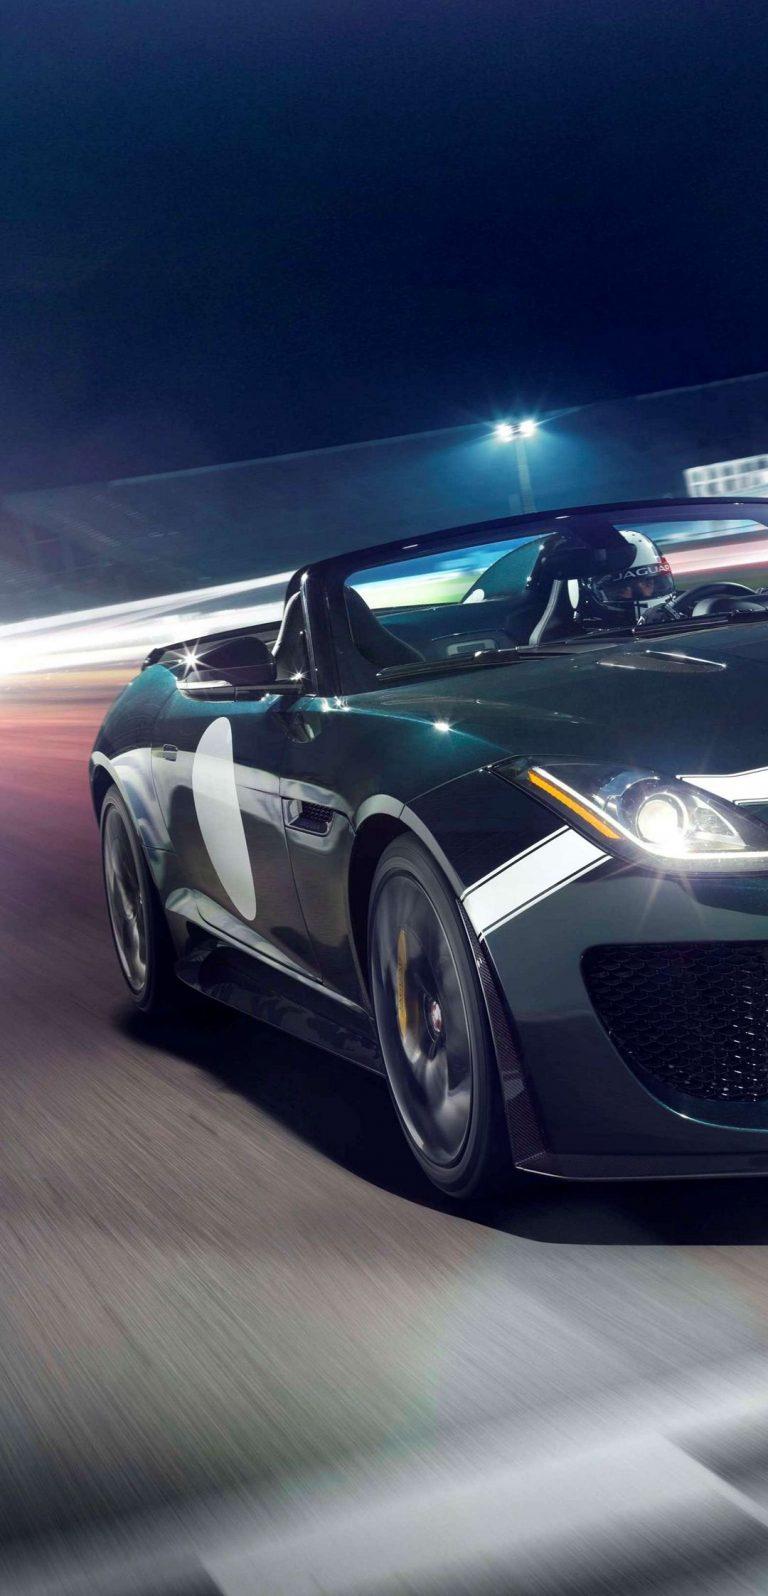 Jaguar F Type Project 7 2014 Wallpaper 1080x2244 768x1596